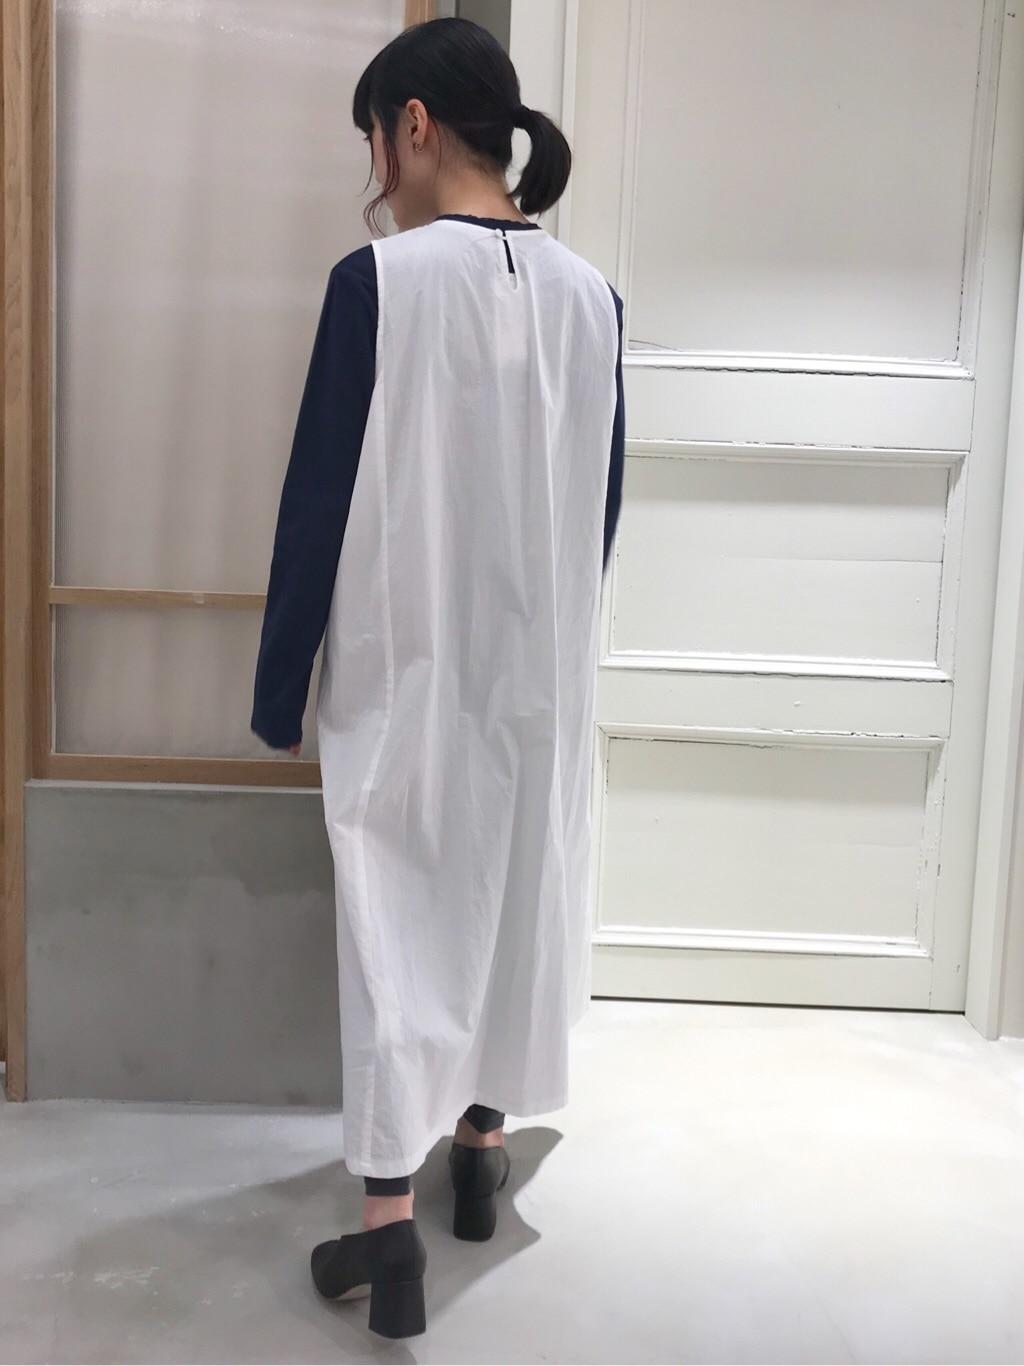 bulle de savon 渋谷スクランブルスクエア 身長:153cm 2020.01.12